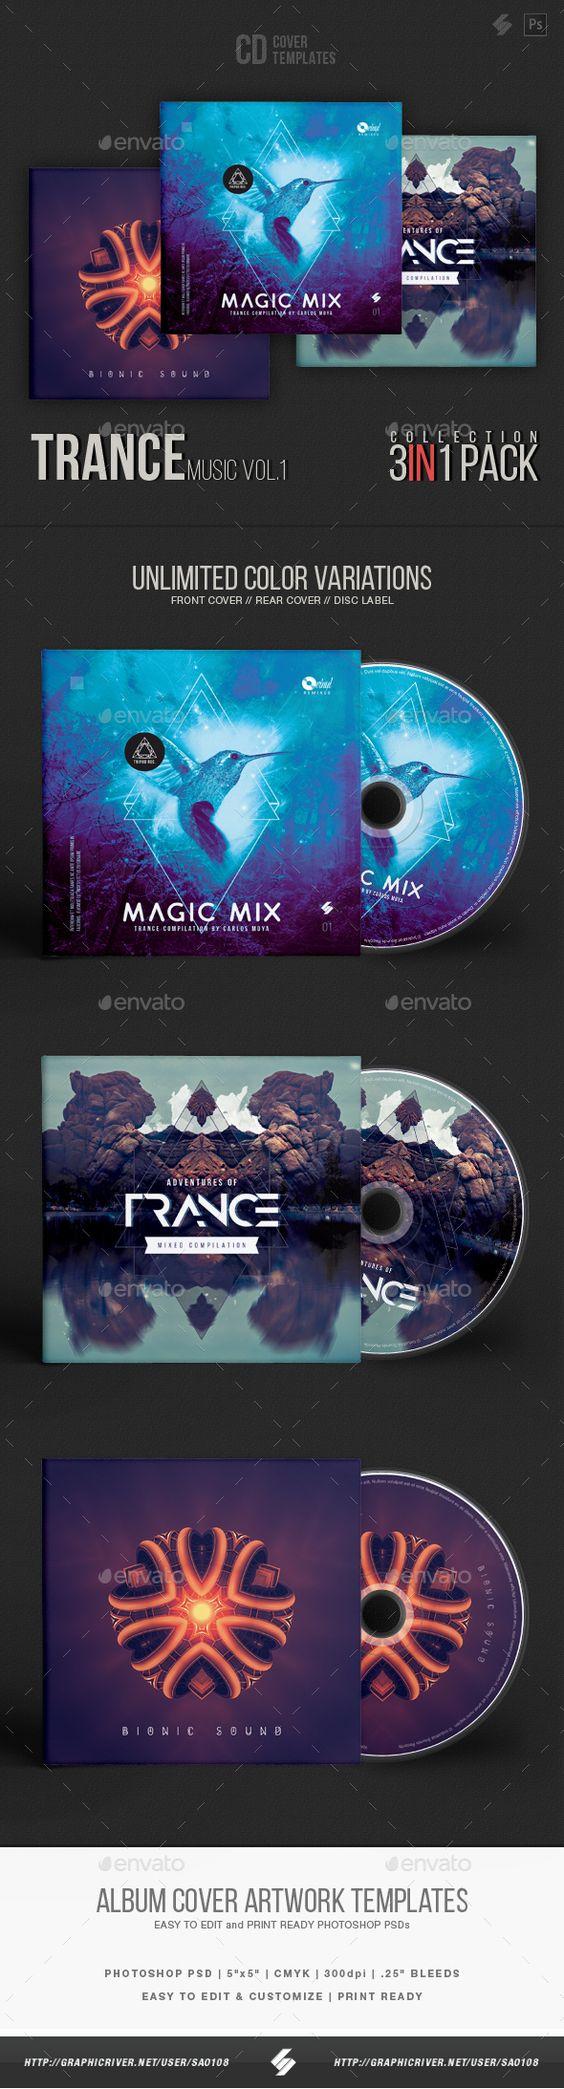 trance music cd cover artwork templates bundle cd cover trance music cd cover artwork templates bundle cd dvd artwork print